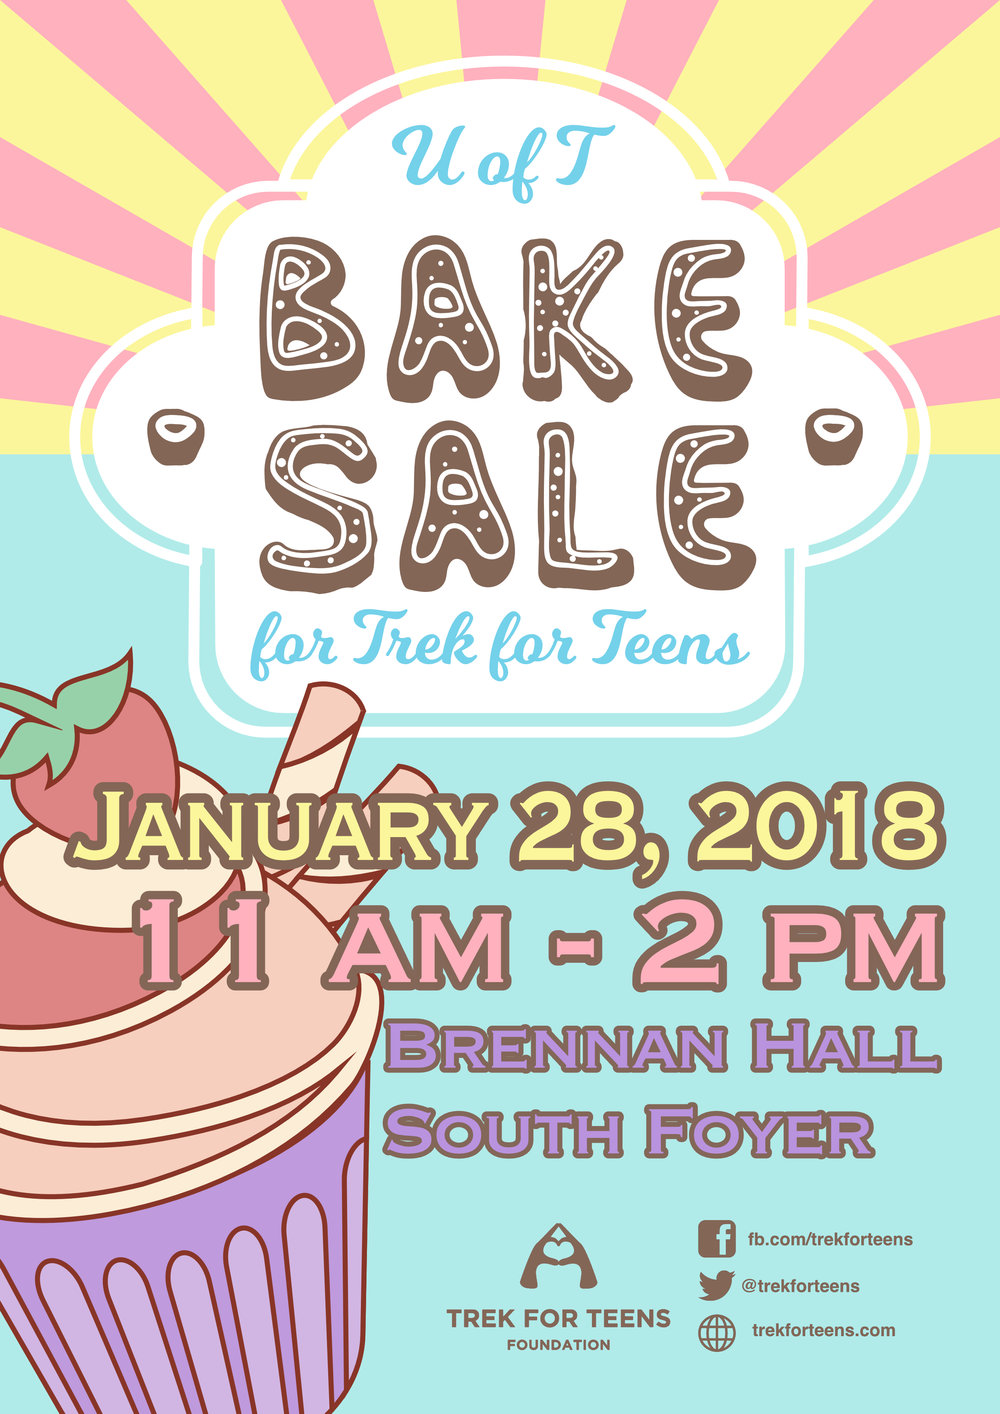 bake sale new.jpg